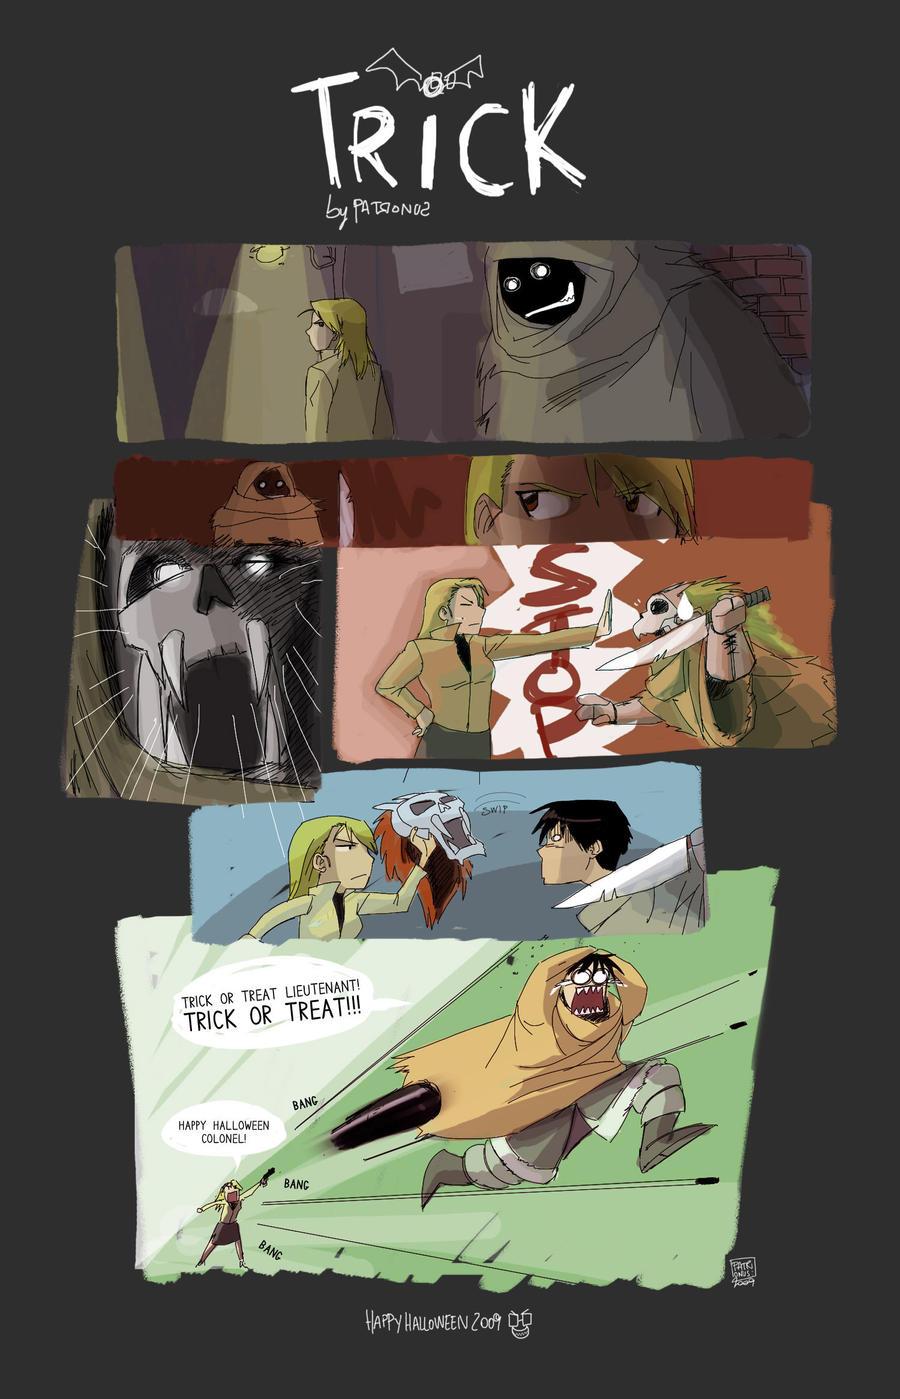 Trick - Halloween 2009 by patronustrip